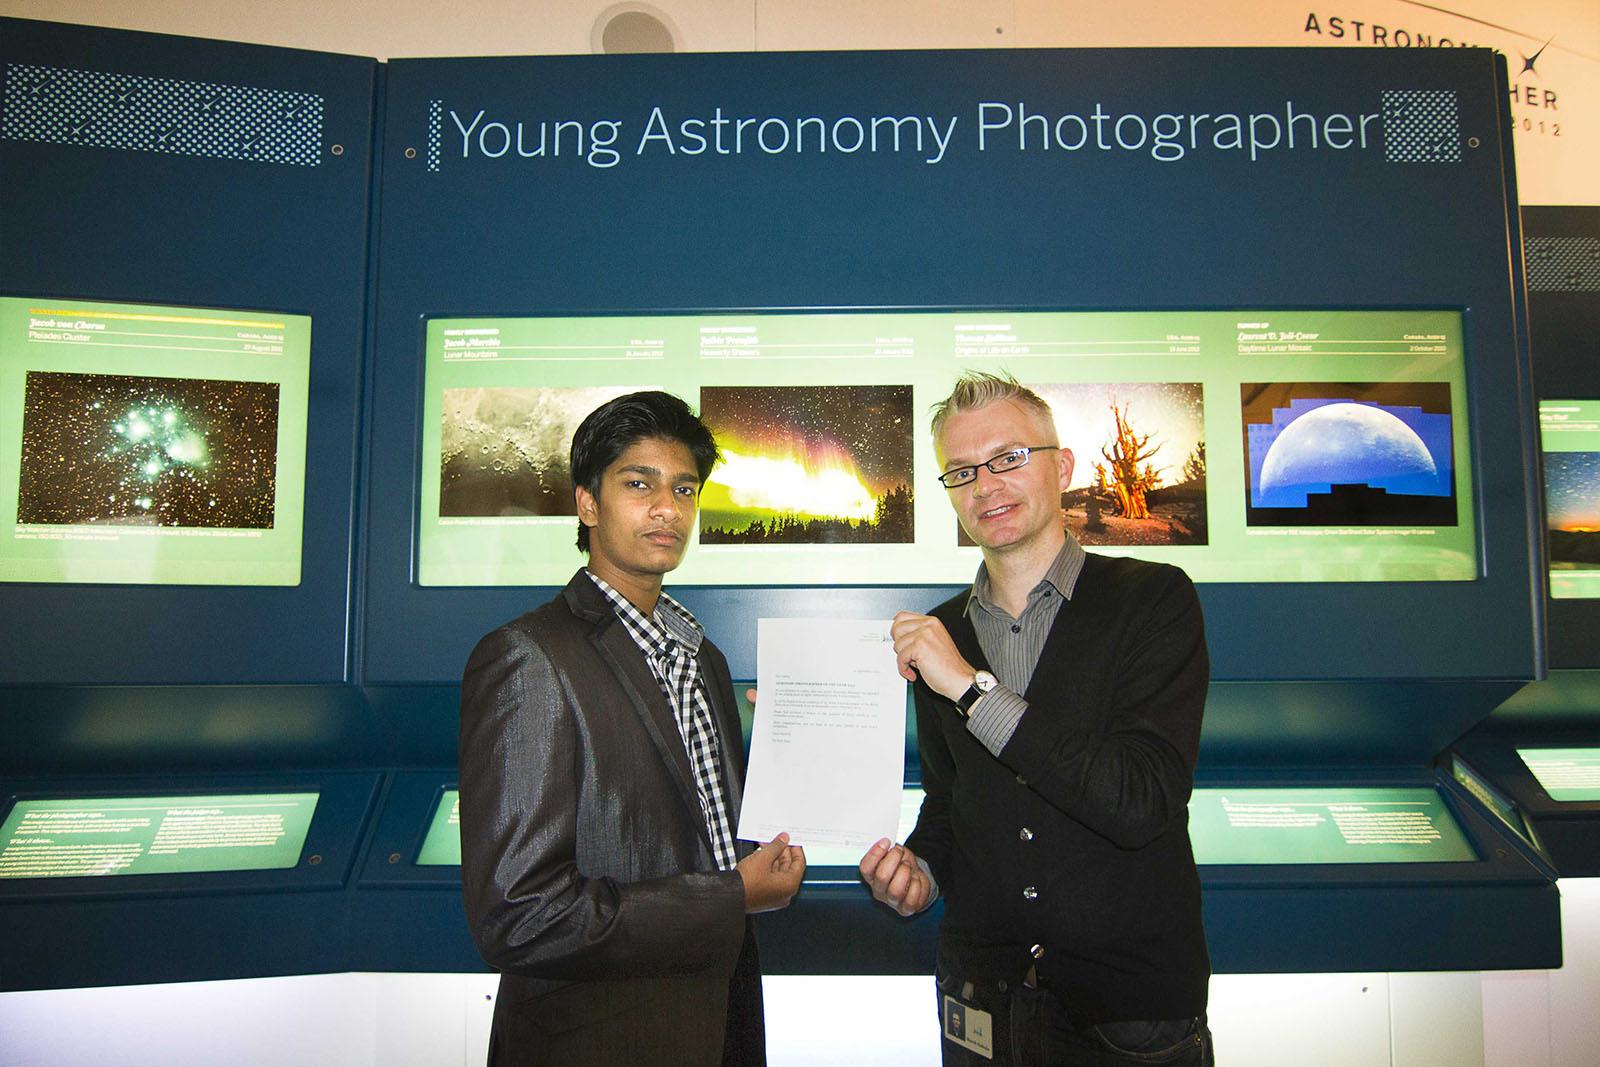 The Award winning ceremony, Greenwich, London